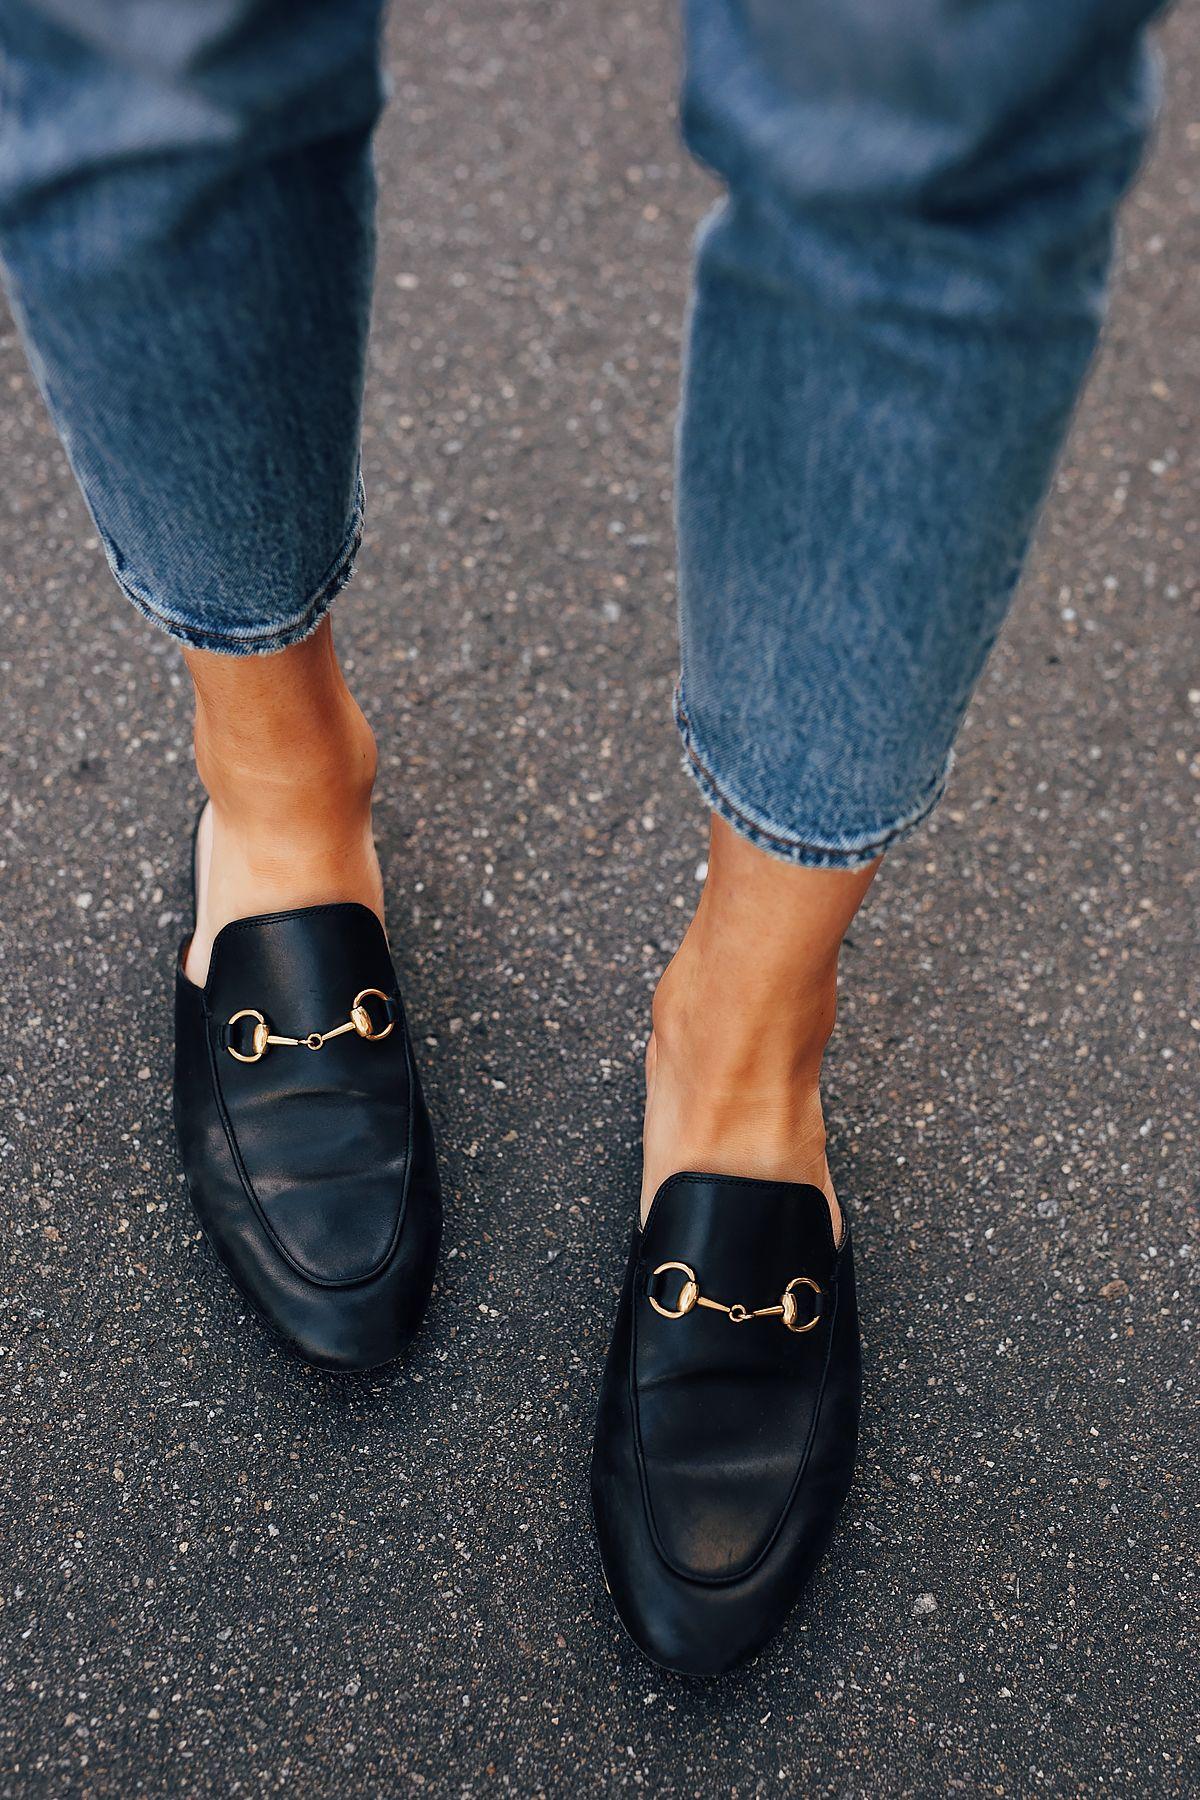 Fashion Jackson Wearing Levis 501 Jeans Gucci Princetown Mules Black Gucci Loafers Women Mule Shoes Outfit Dress Shoes Men [ 1800 x 1200 Pixel ]